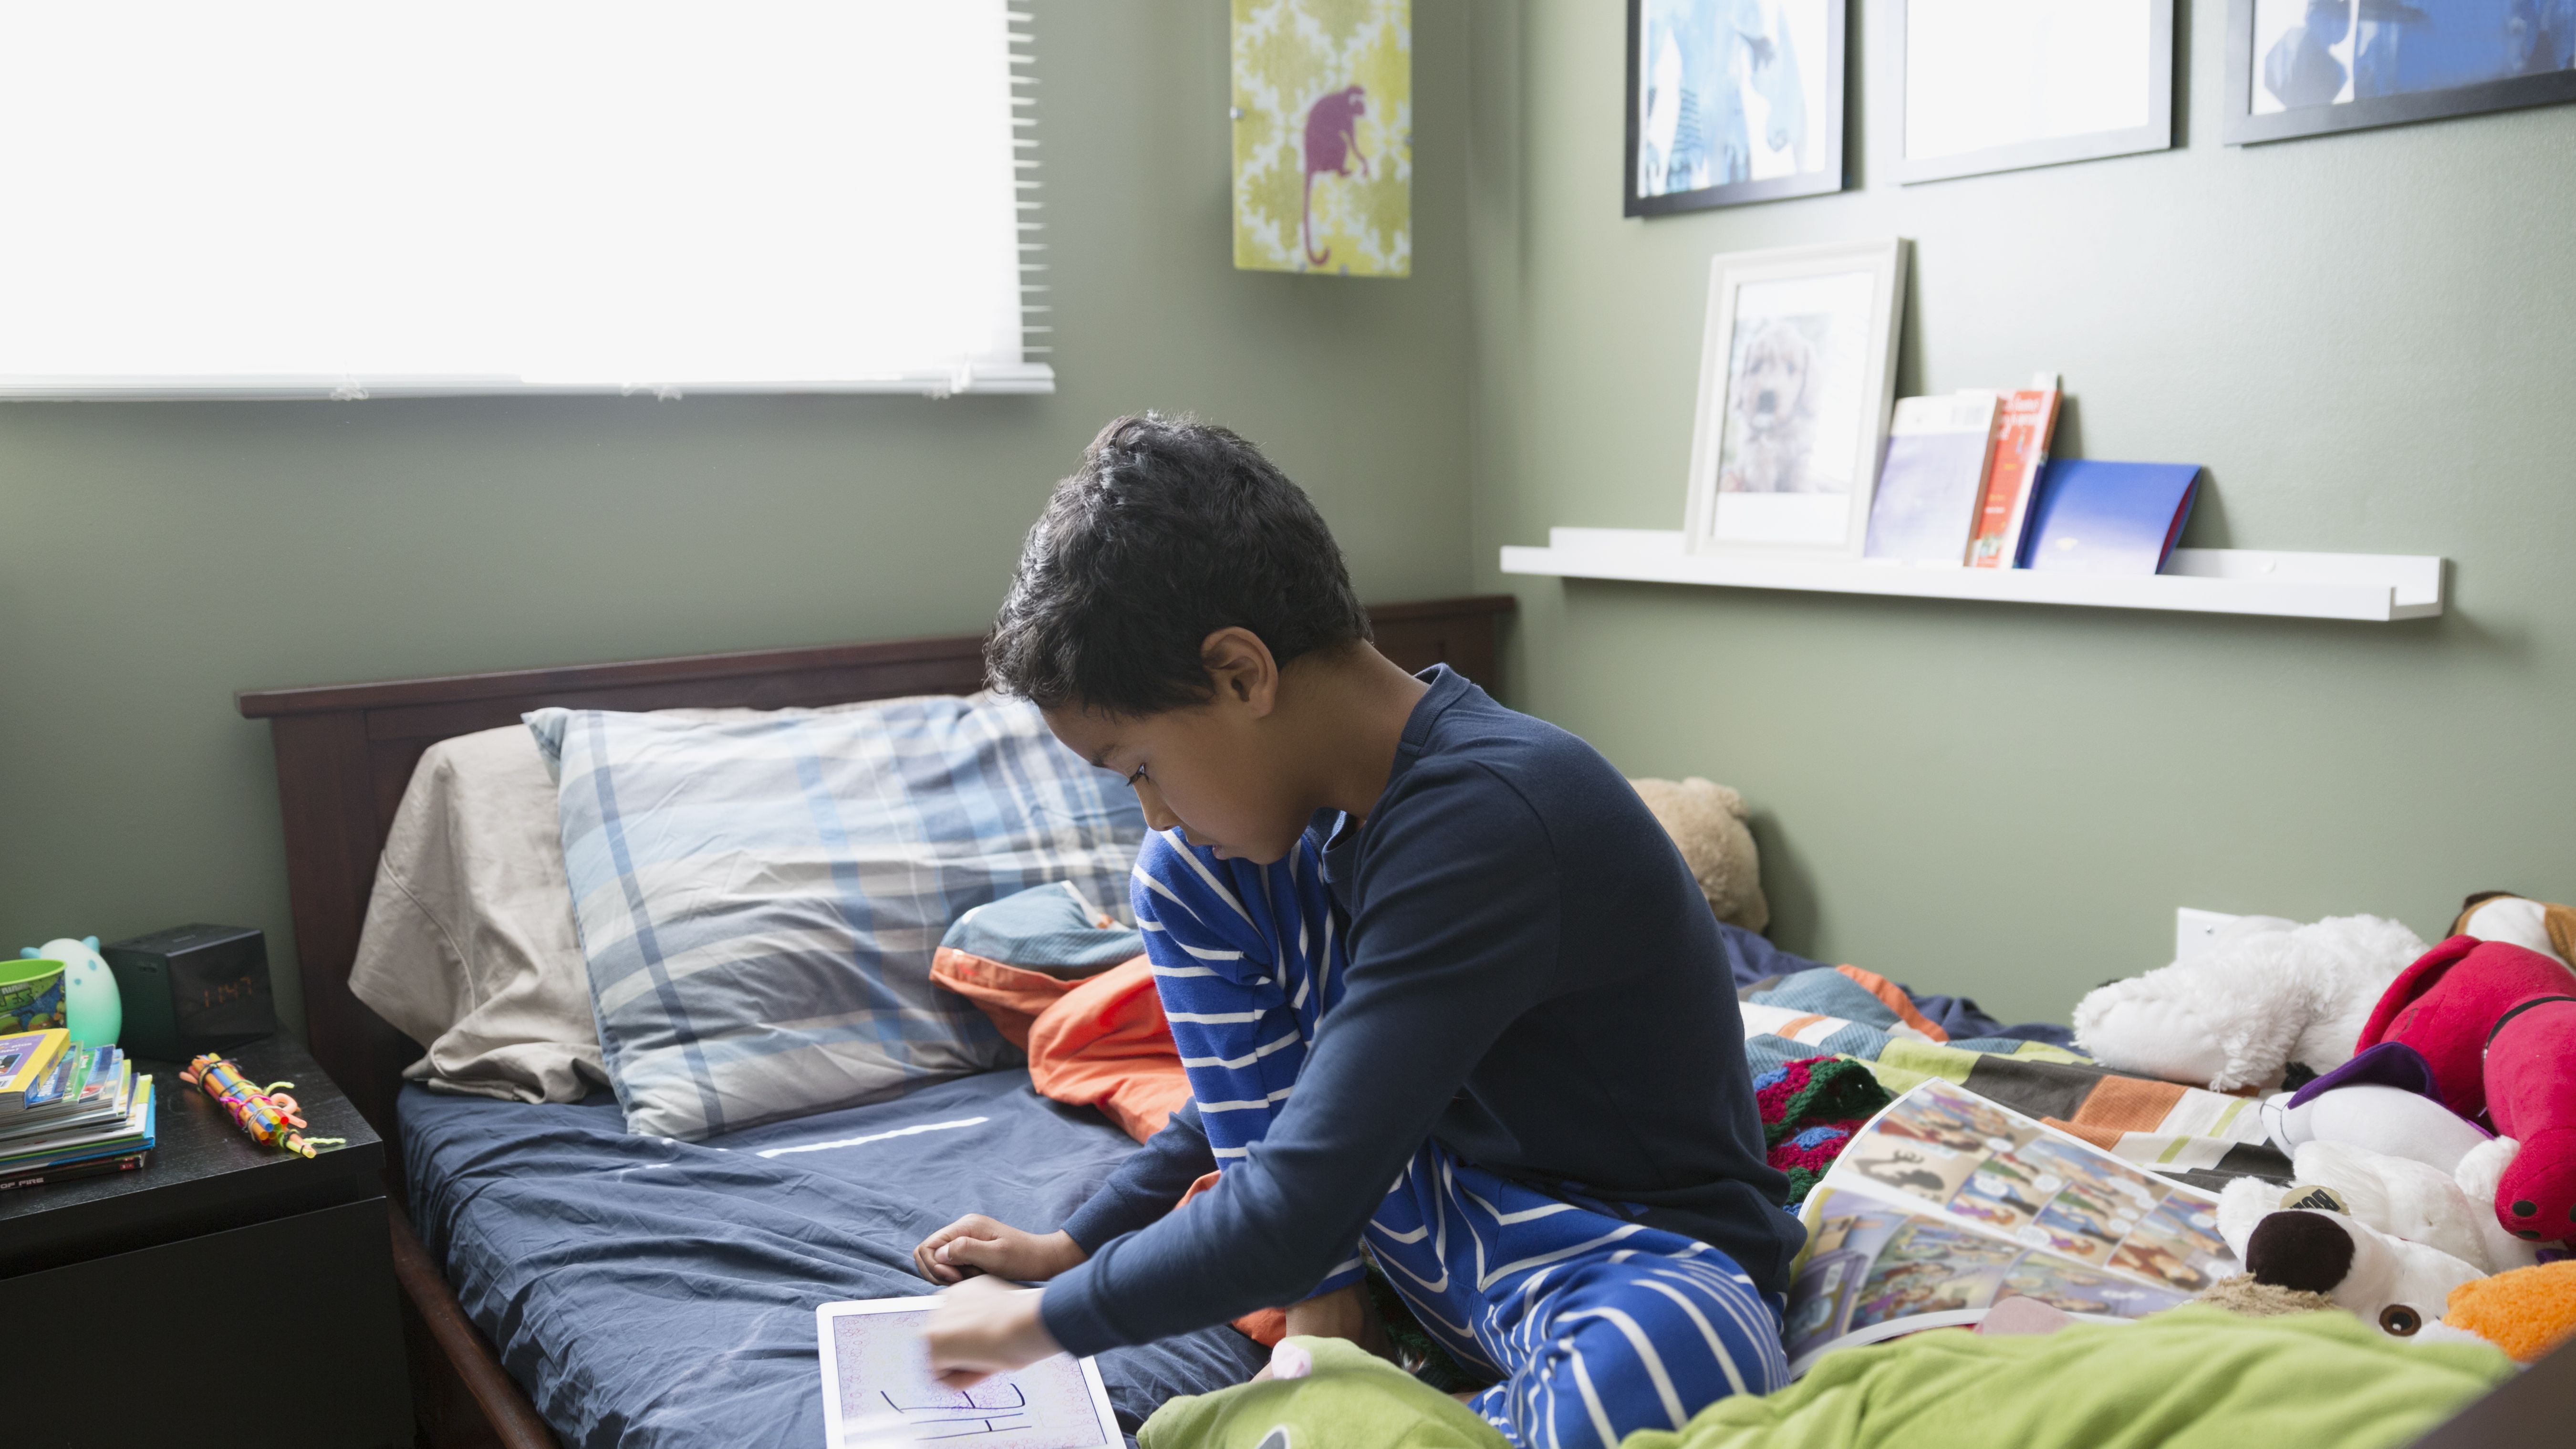 How Living Accommodations Impact Child Custody